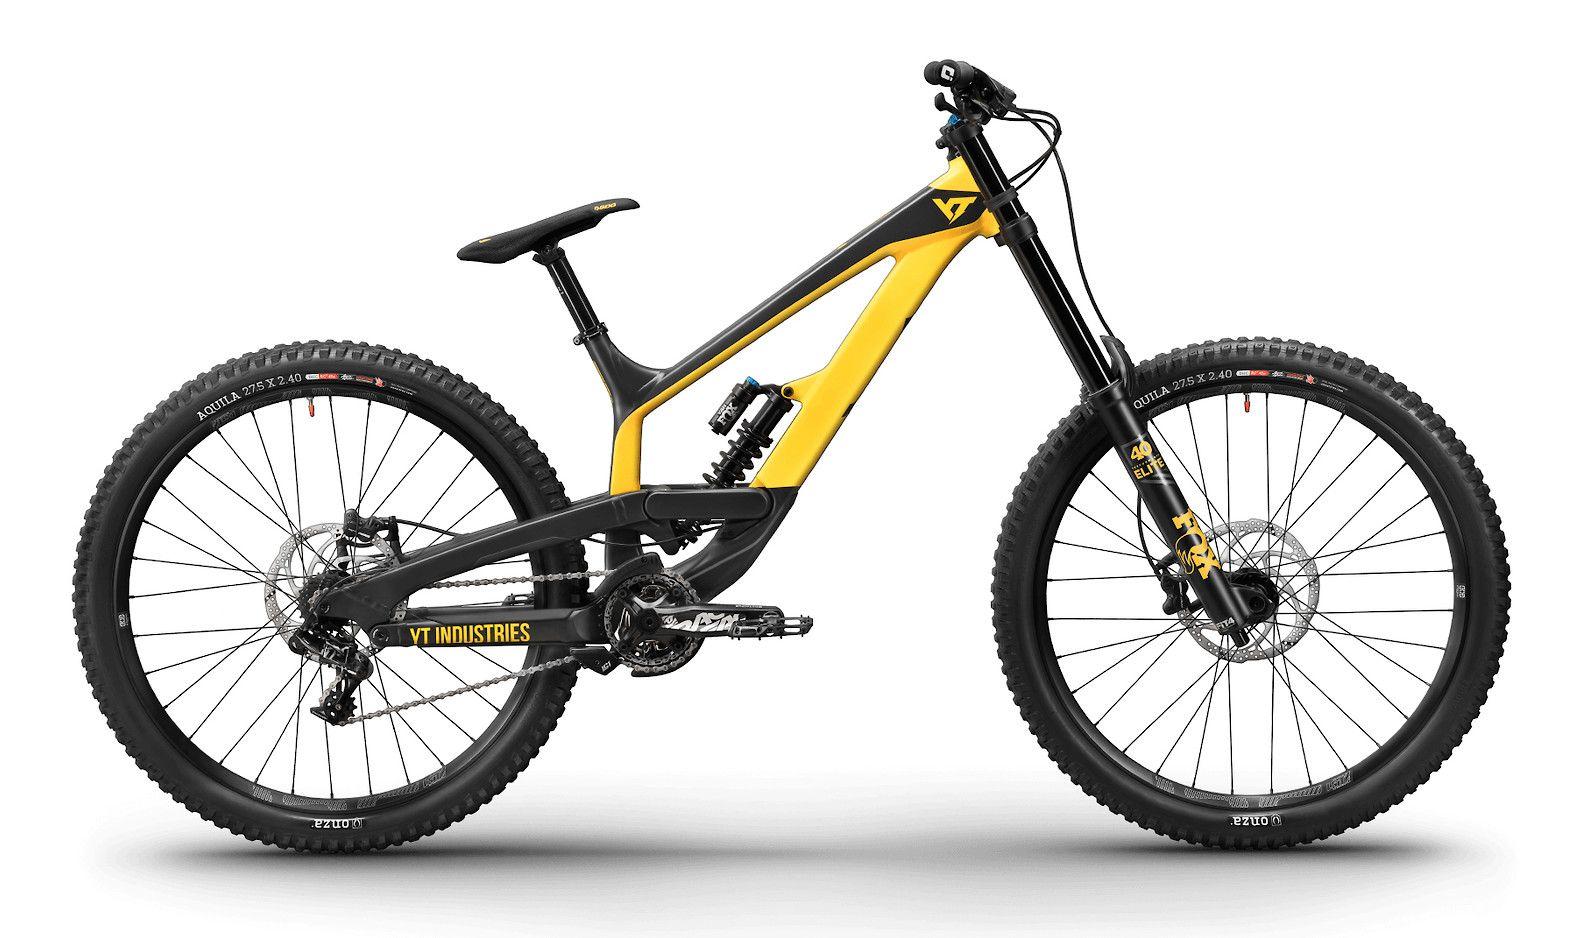 2019 Yt Tues 27 Al Bike Downhill Bike Bike Bicycle